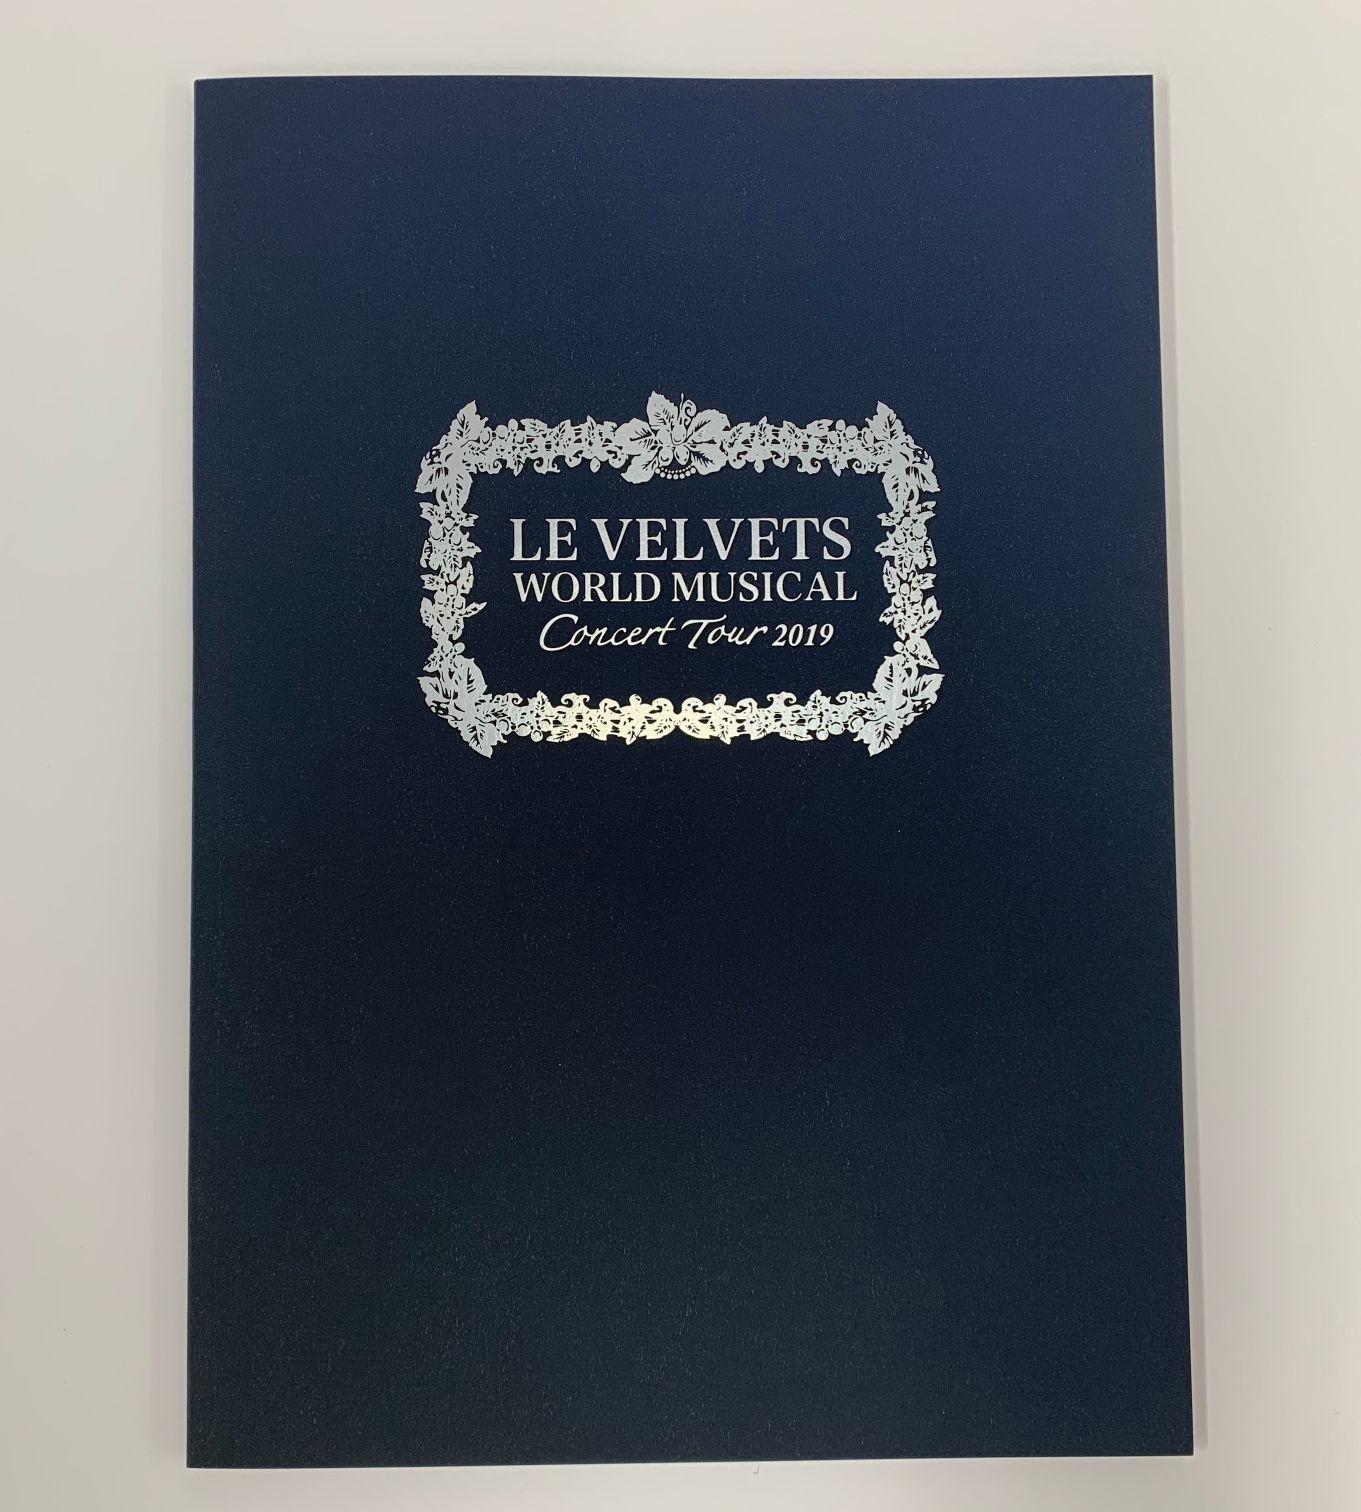 LE VELVETS コンサート 2019「WORLD MUSICAL」ツアーパンフレット